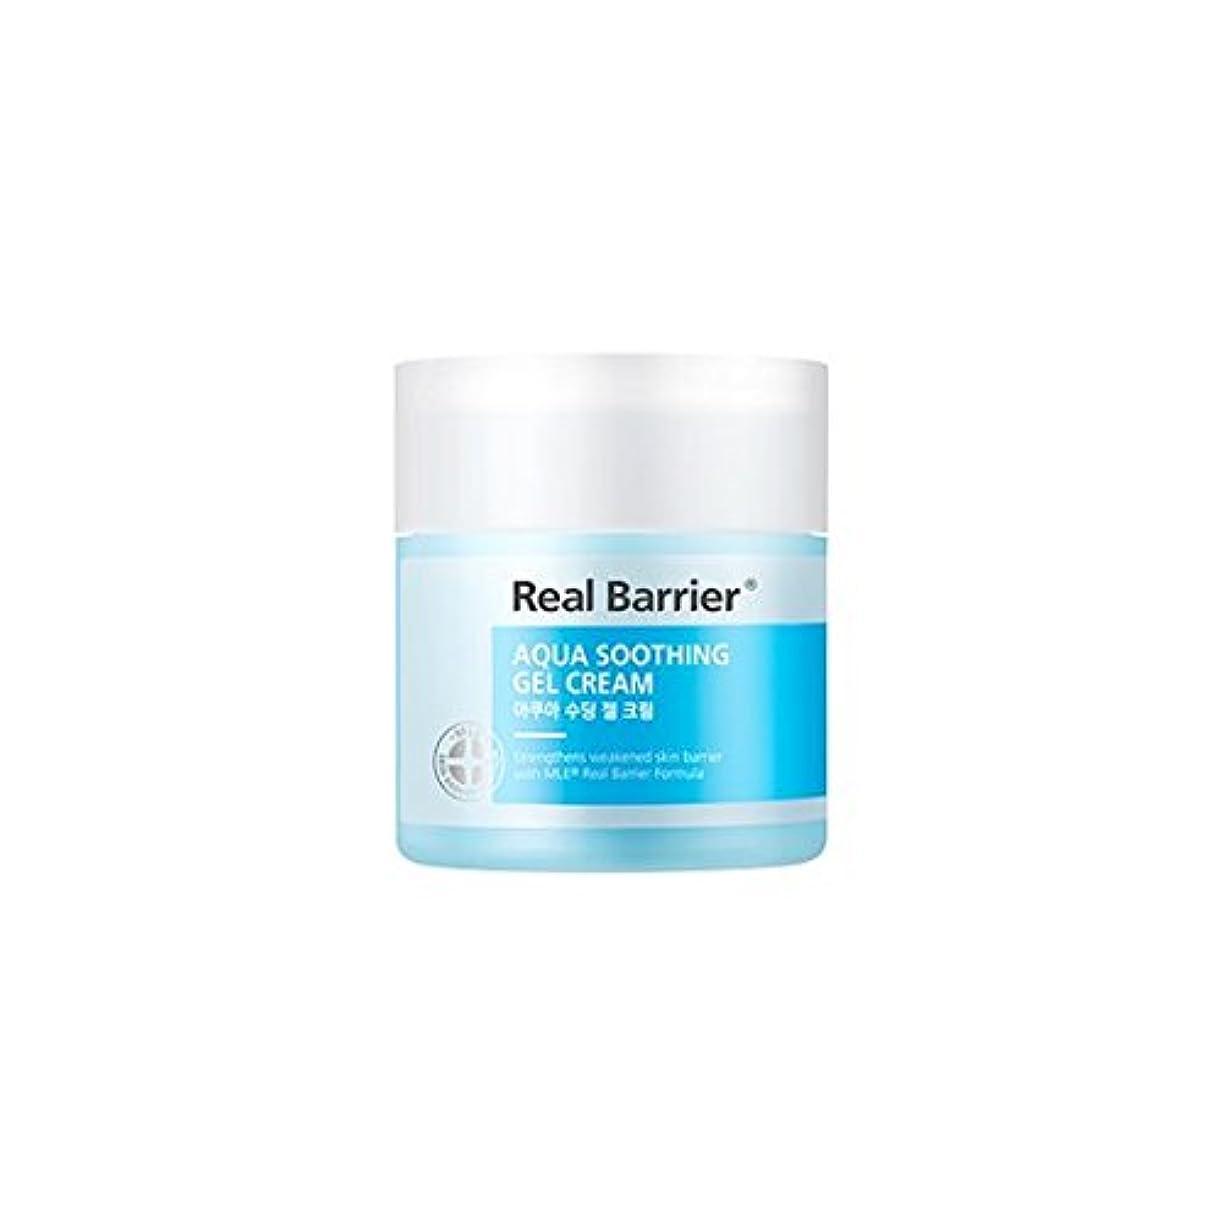 ATOPALM Real Barrier リアルバリアアクアスーディングジェルクリーム50ml / REAL BARRIER AQUA SOOTHING GEL CREAM [海外直送品]